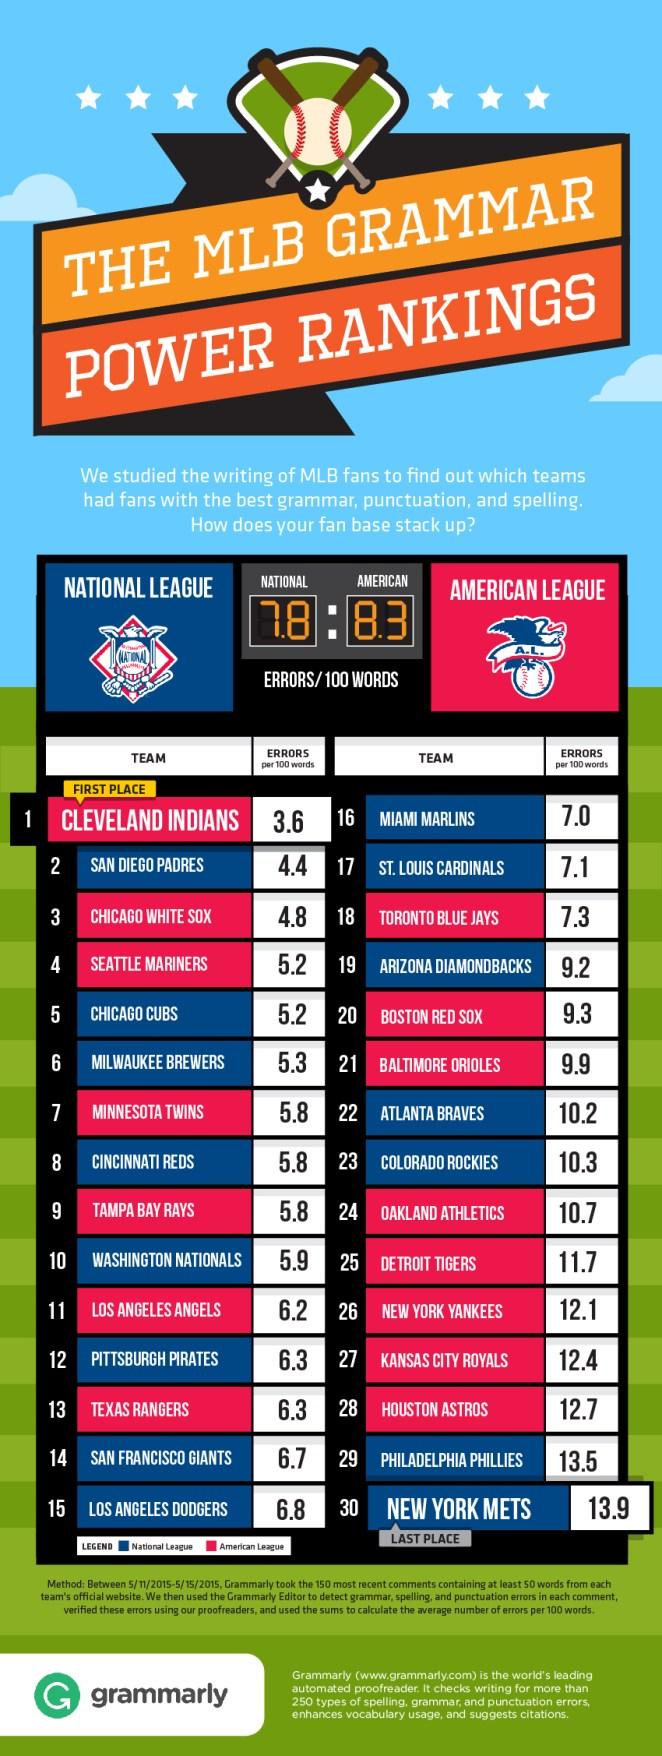 MLB Grammar Rankings by Grammarly's Grammar Checker